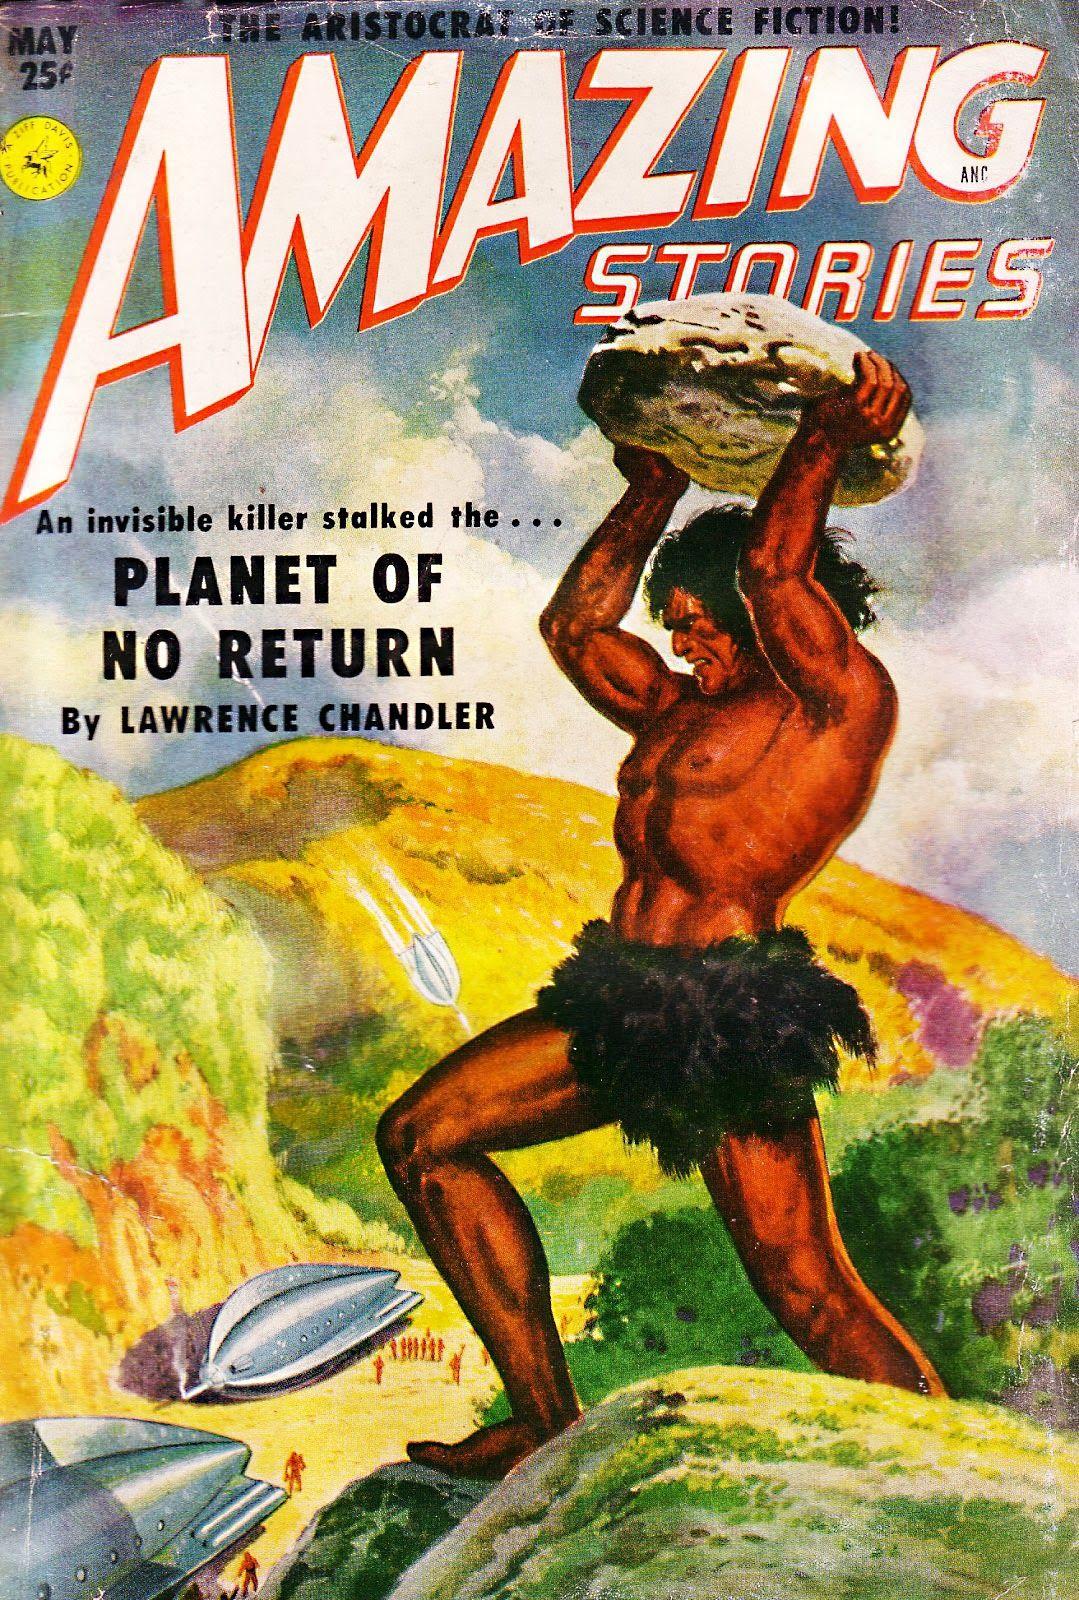 The Geeky Nerfherder: Sci-Fi, Fantasy & Horror Cover Art: Robert Gibson Jones (Part 2 - The 1950's)